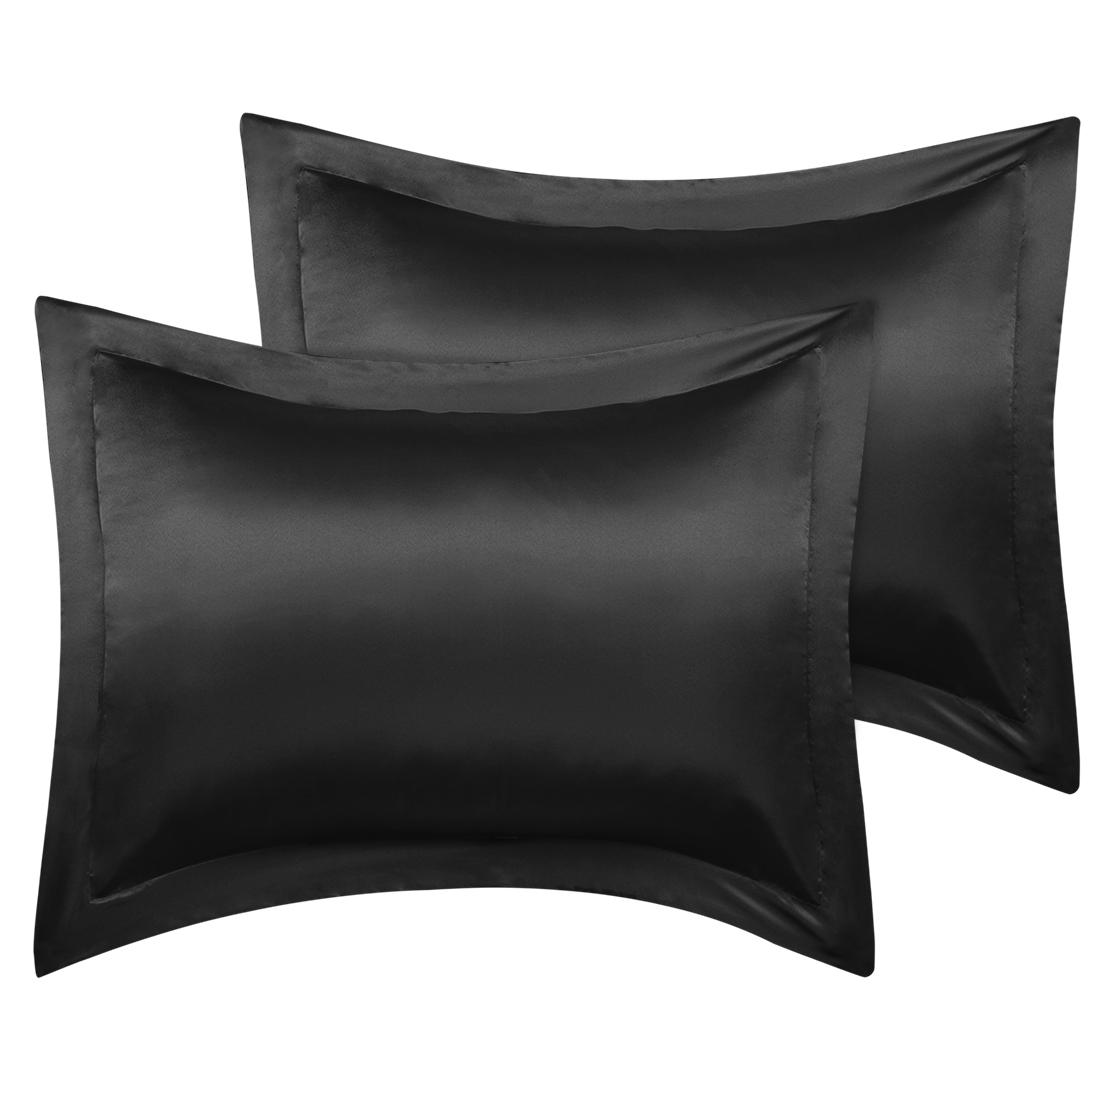 2 Pcs Black Pillow Shams Satin Pillow Cases Standard Oxford Pillowcases